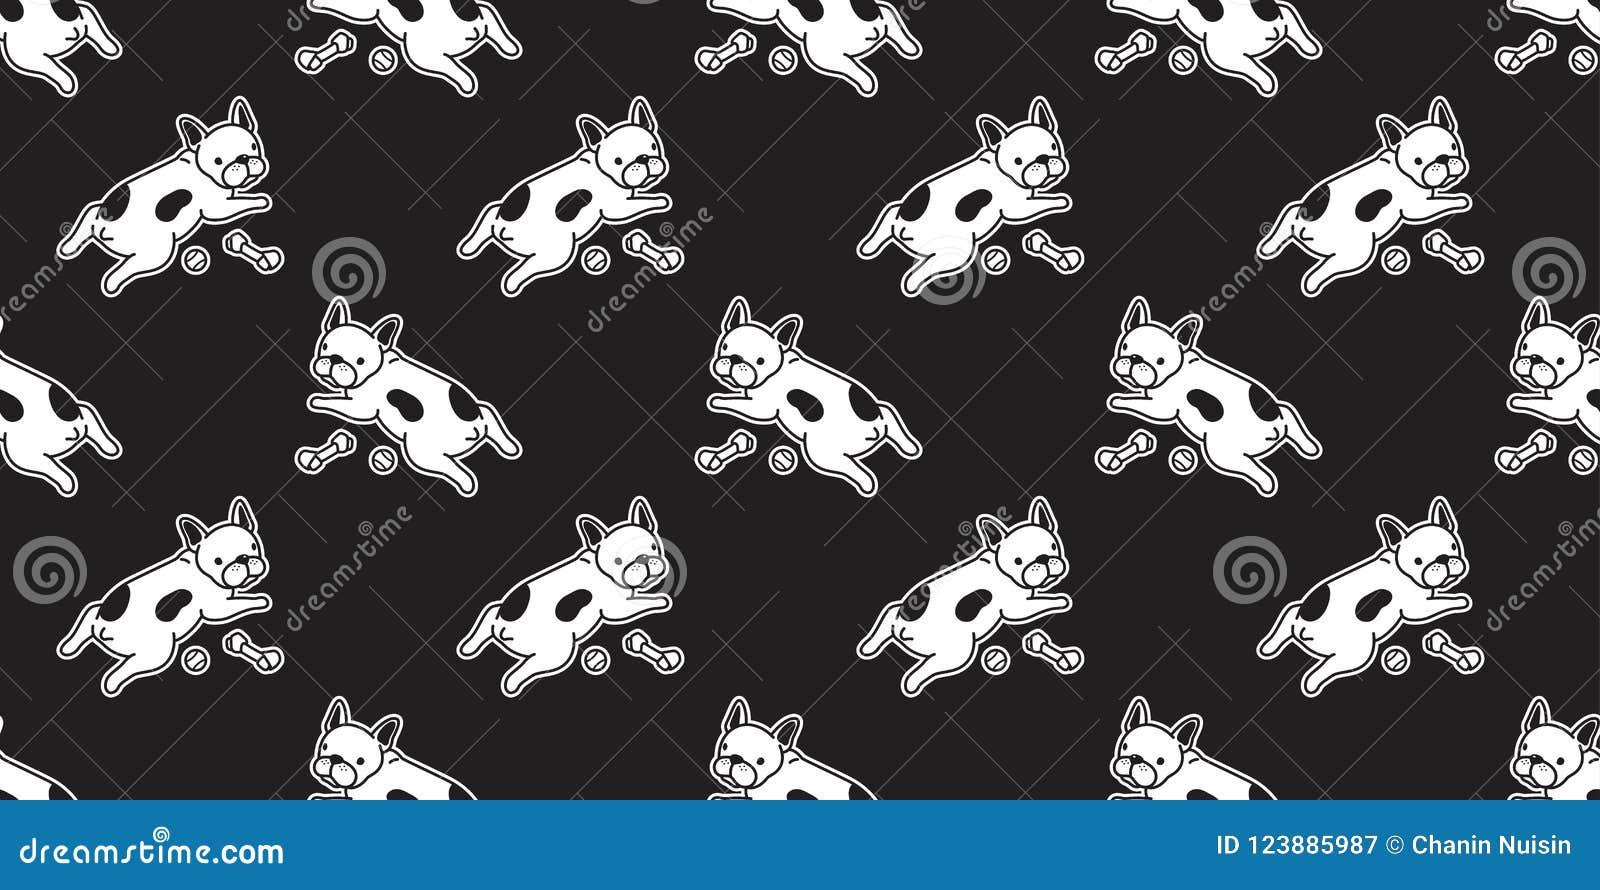 Dog Seamless Pattern French Bulldog Vector Isolated Wallpaper Background Doodle Cartoon Black Stock Illustration Illustration Of Corgi Backdrop 123885987